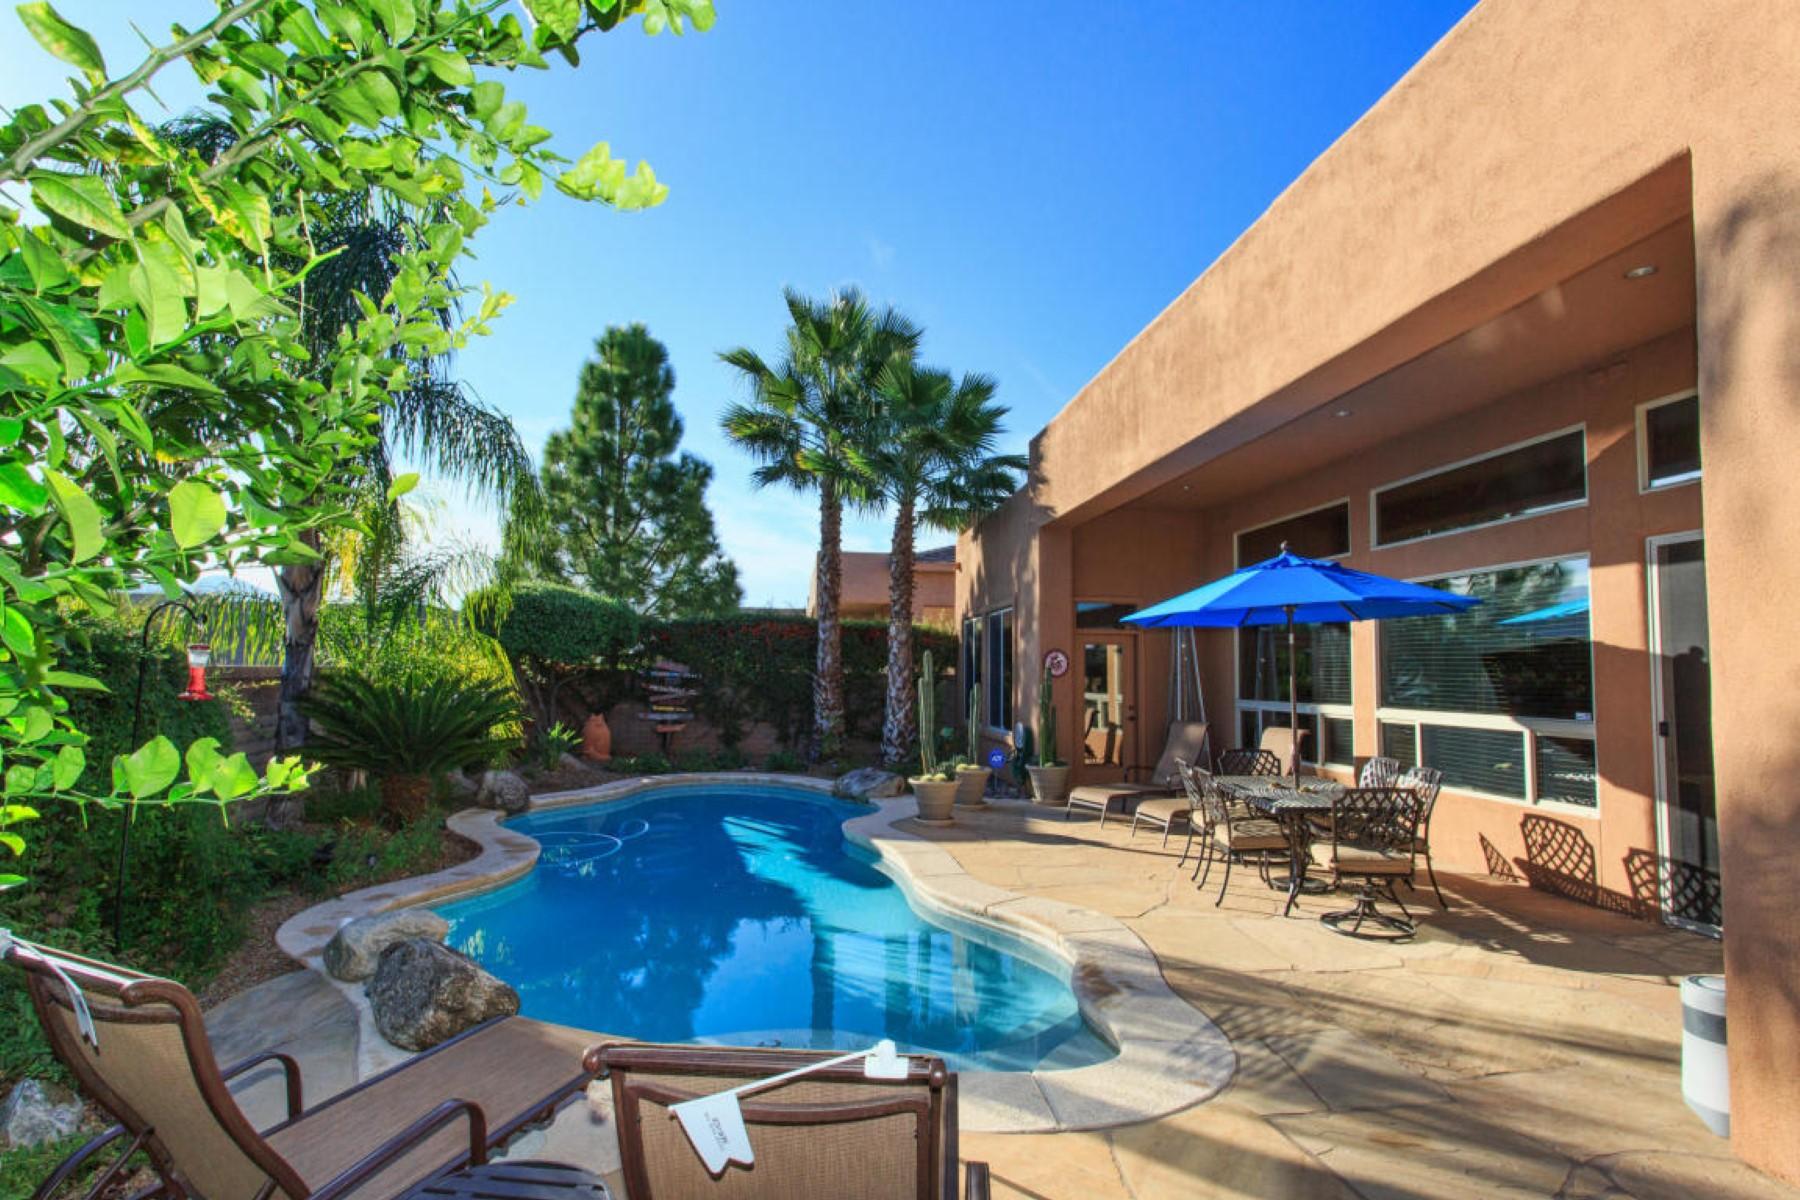 Частный односемейный дом для того Продажа на Highly desirable Fairfield Rancho Vistoso is an upscale gated community 13818 N Slazenger Drive Oro Valley, Аризона 85755 Соединенные Штаты